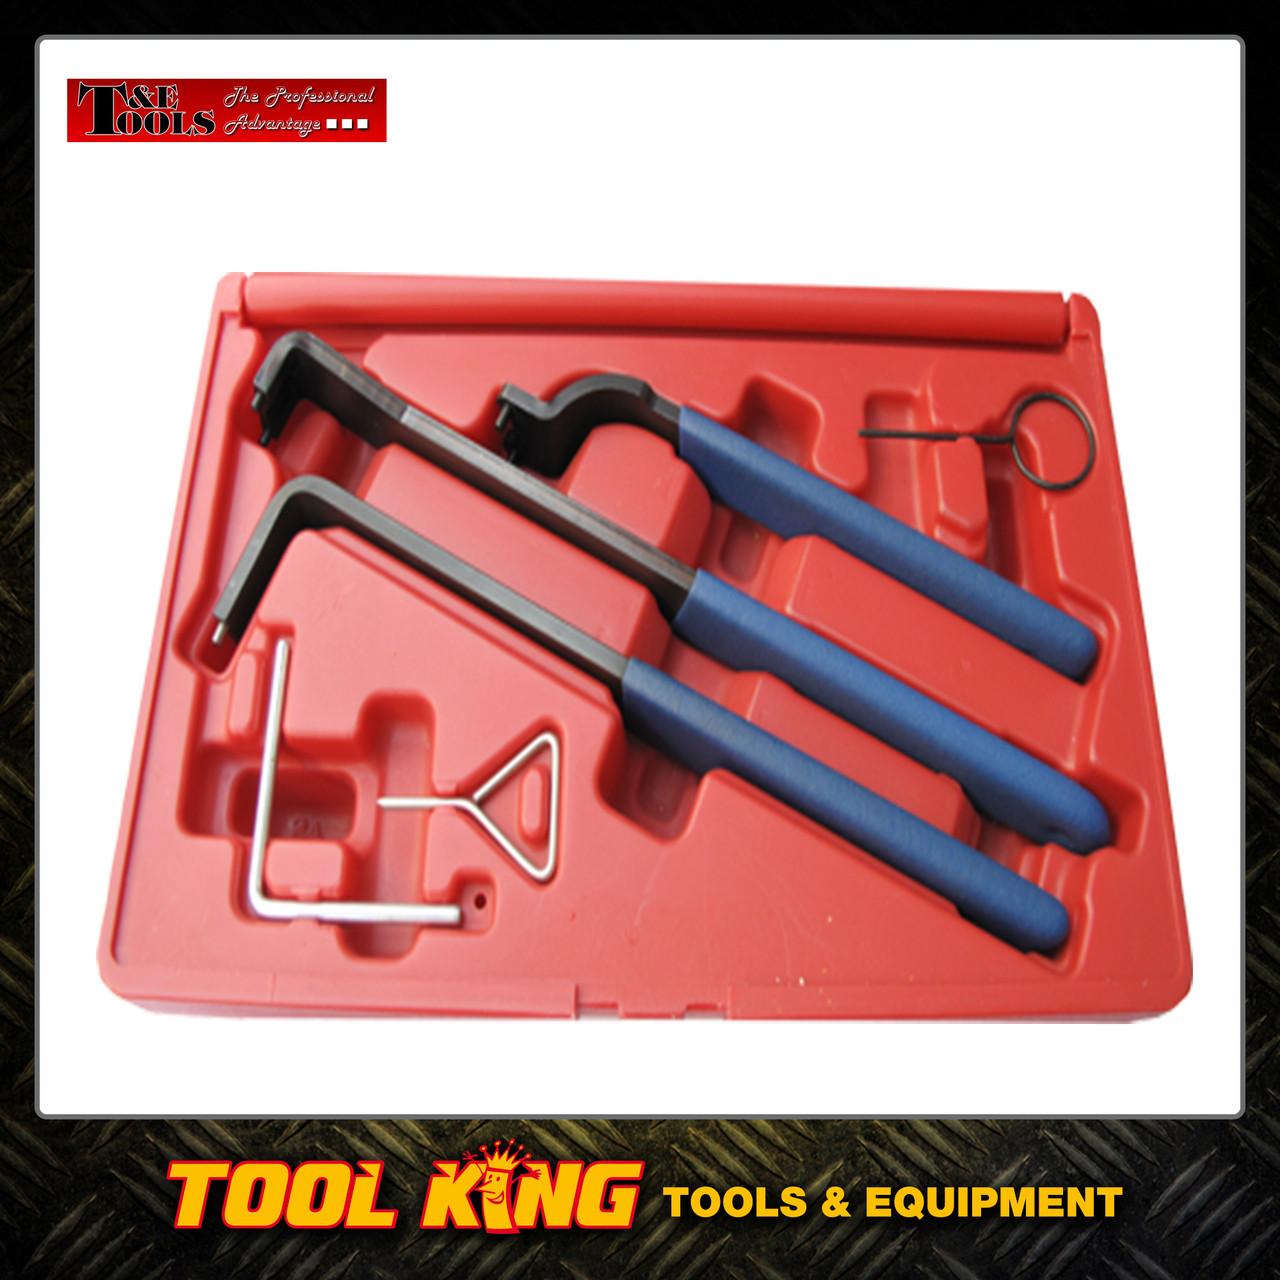 6pc Timing belt Tensioner wrench set VW Audi etc